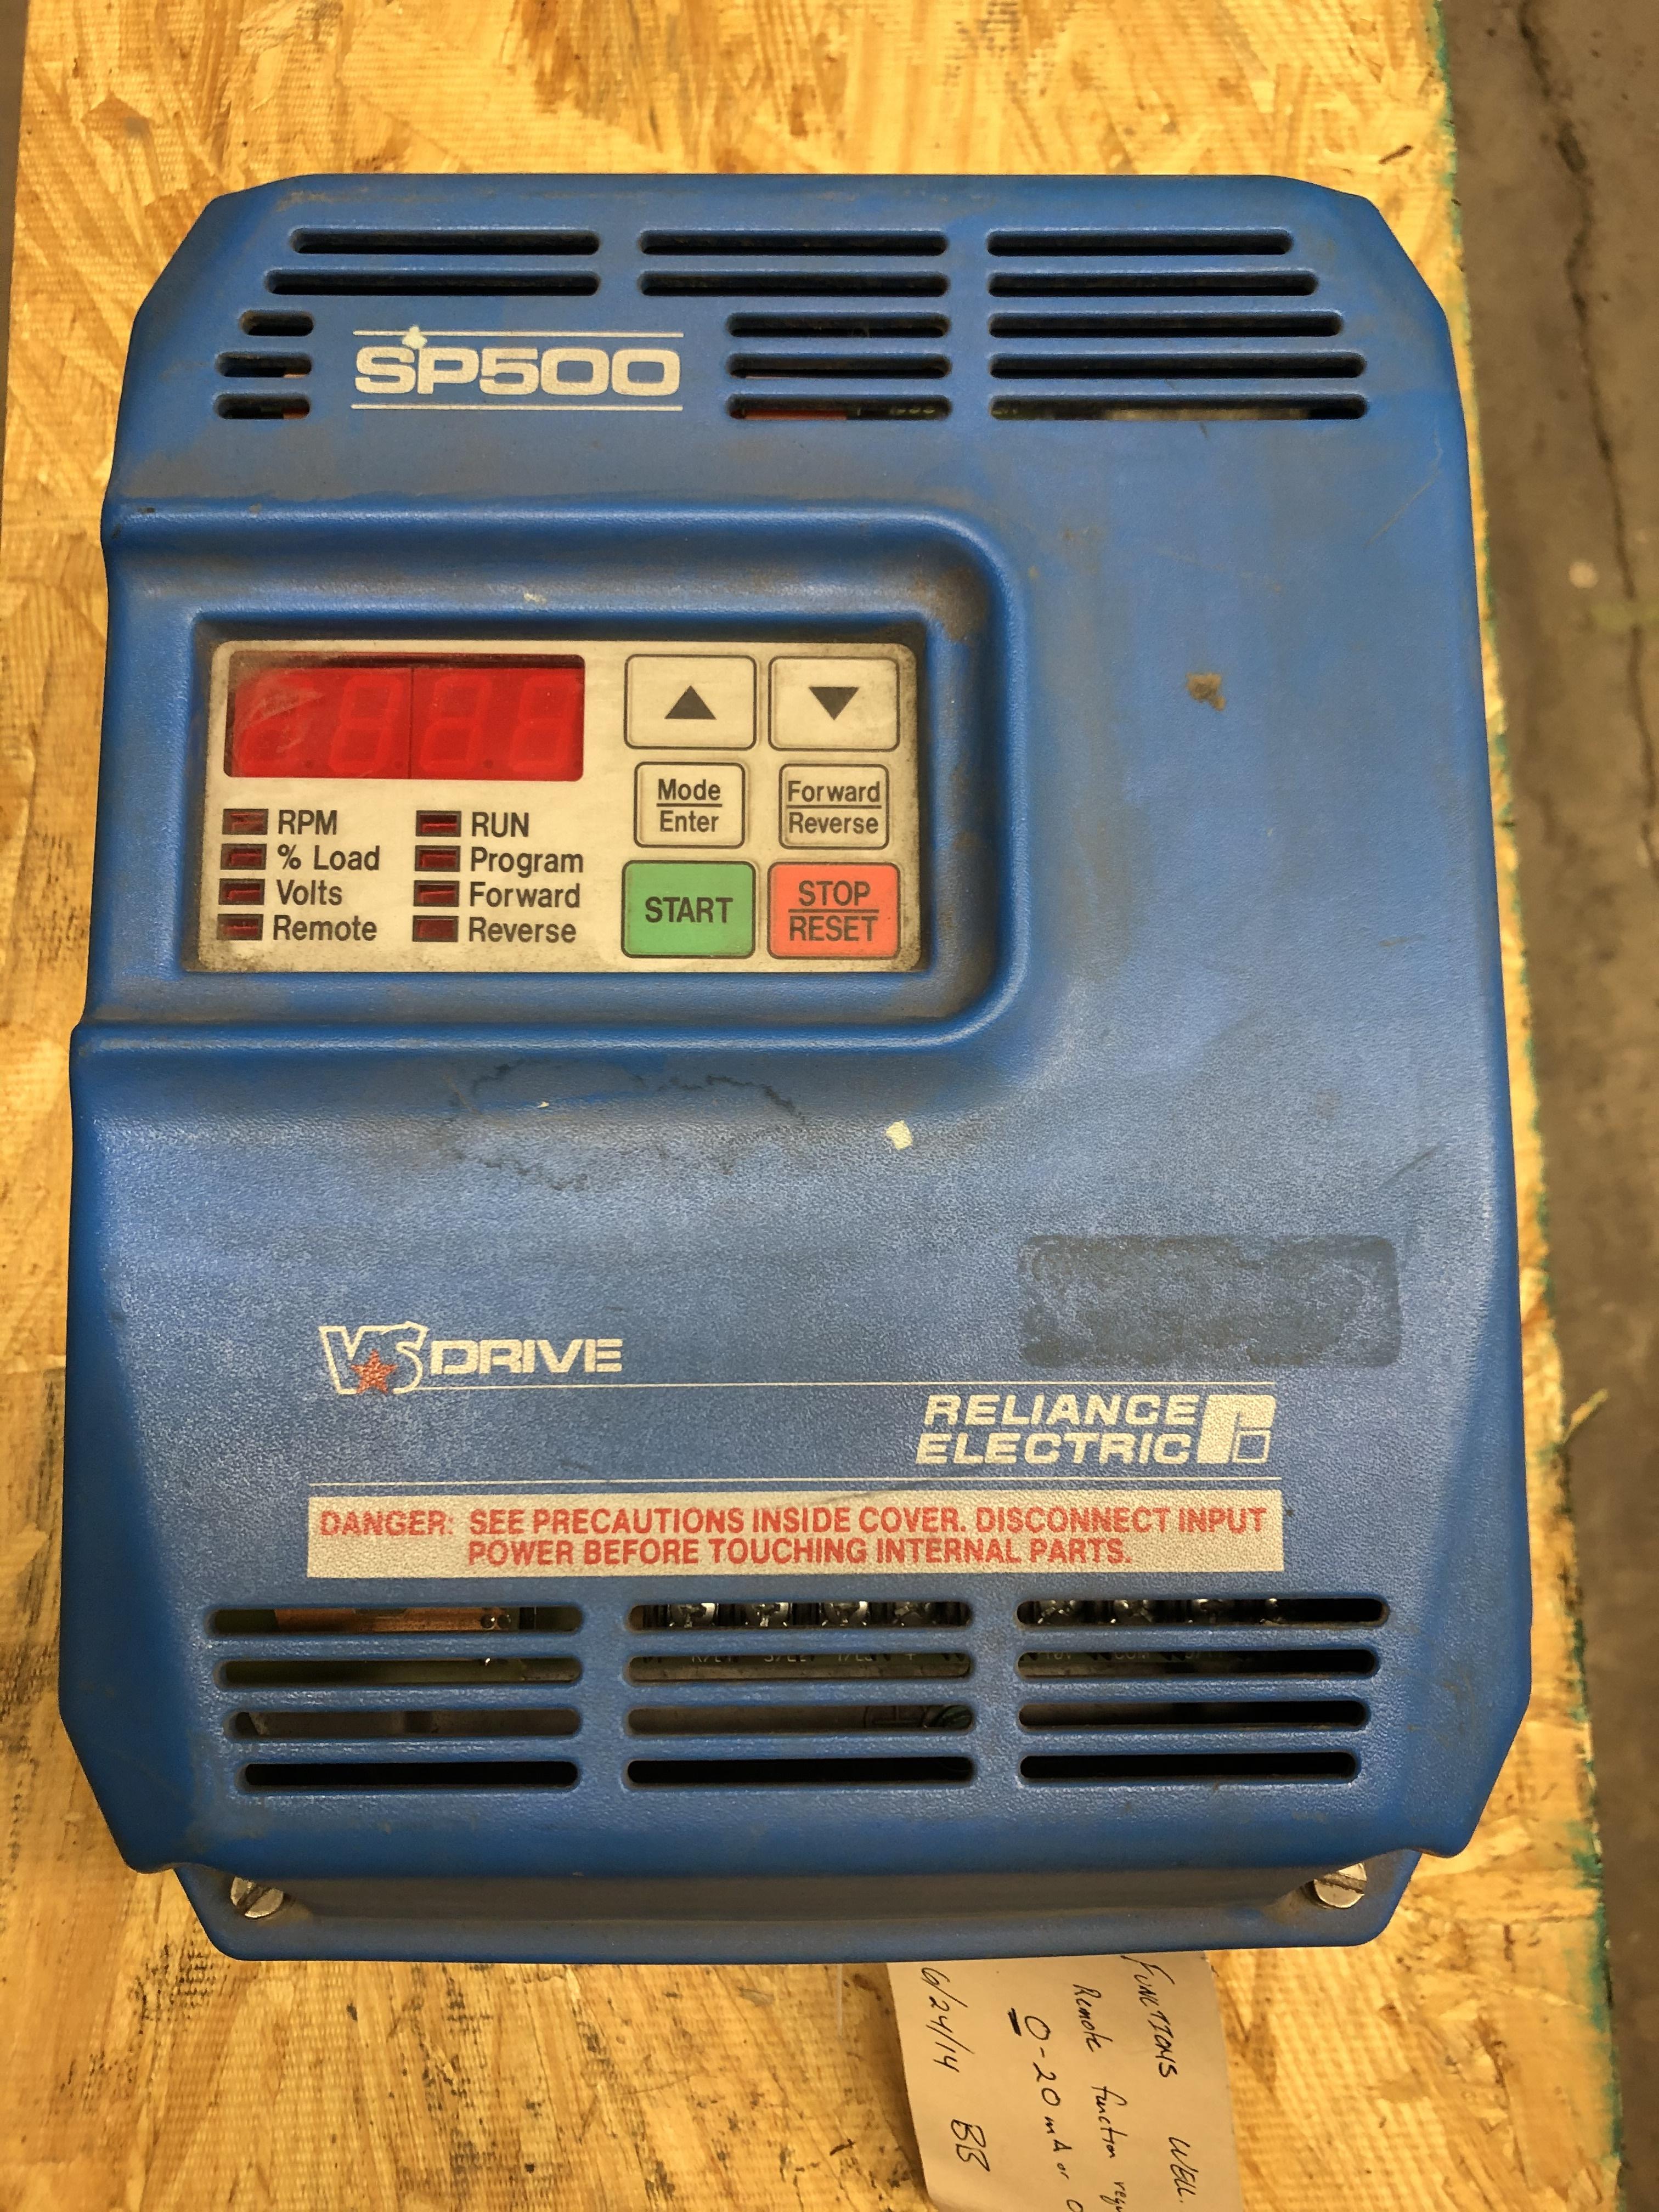 reliance-sp500.jpg